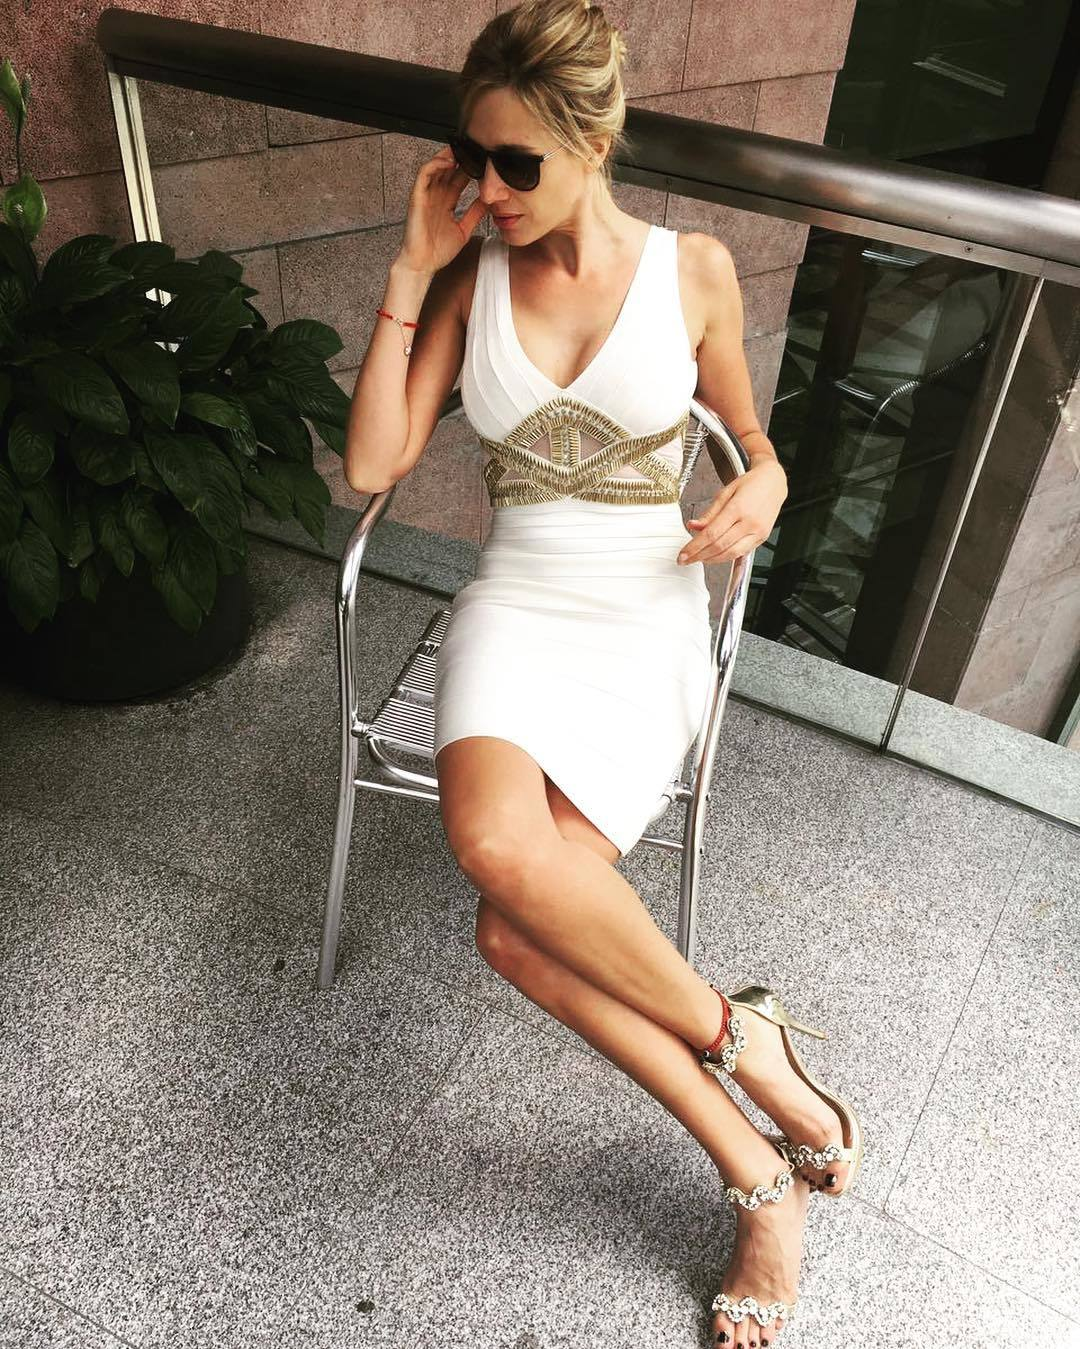 Alina-Moine-Feet-2536937.jpg